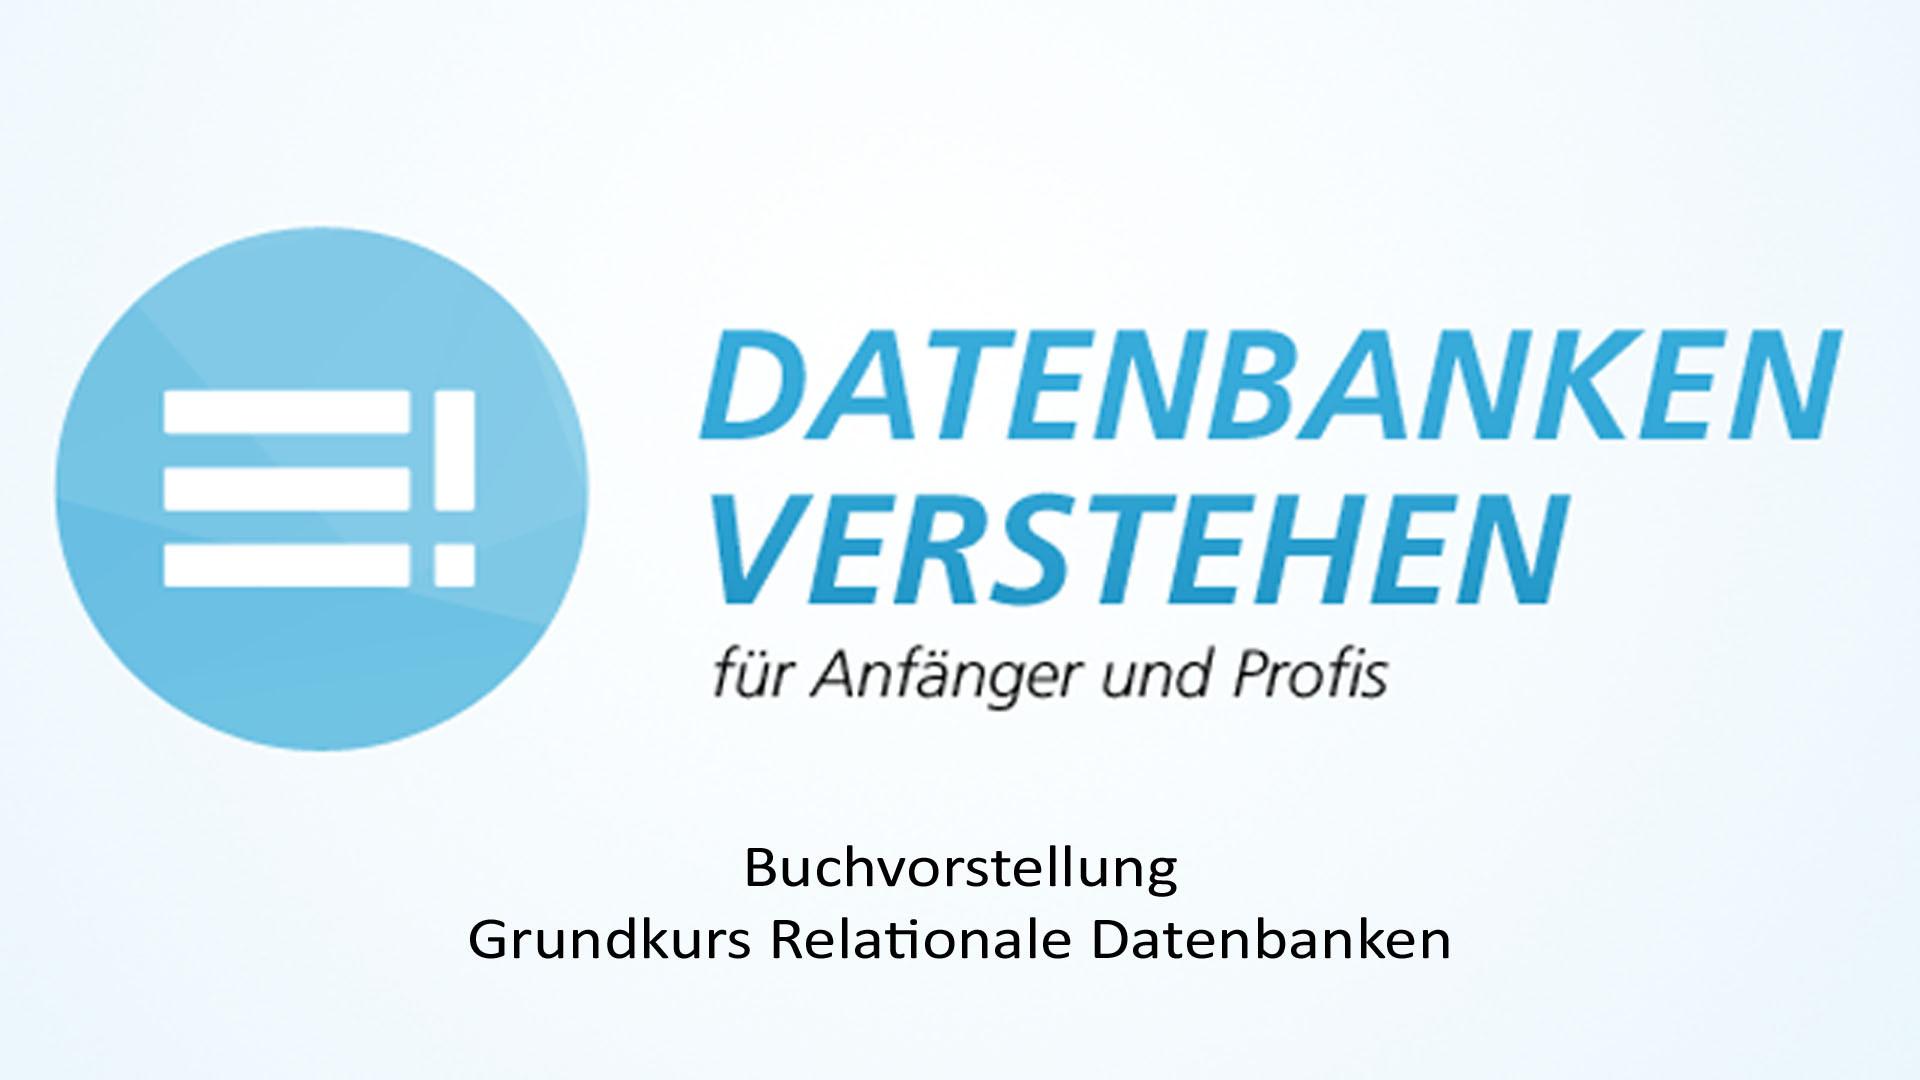 Grundkurs Relationale Datenbanken | Datenbank Blog